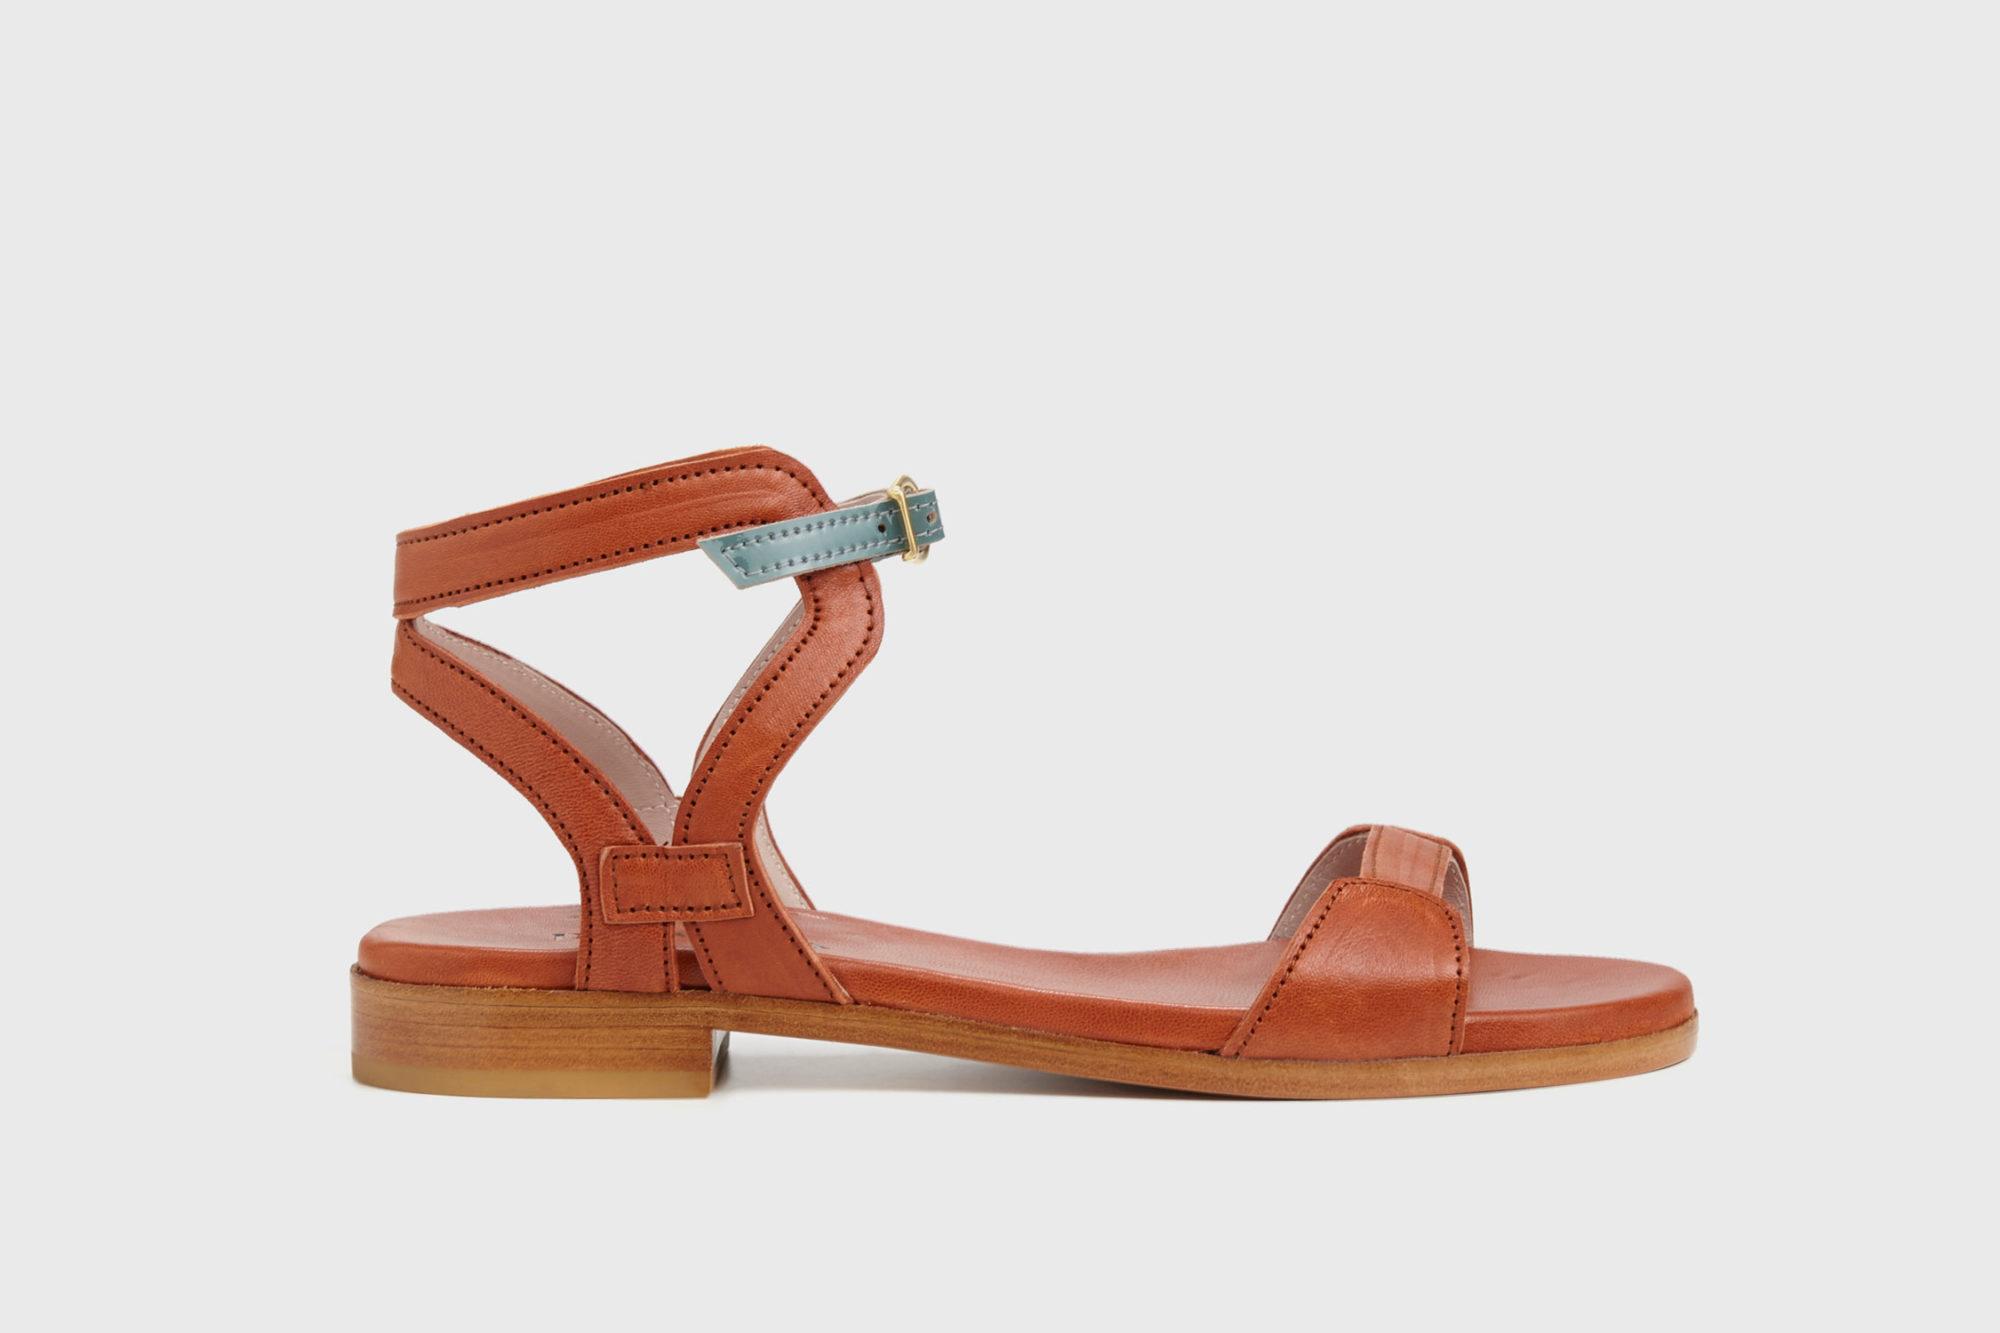 Dorotea sandalia plana Maya cuero ss18 perfil